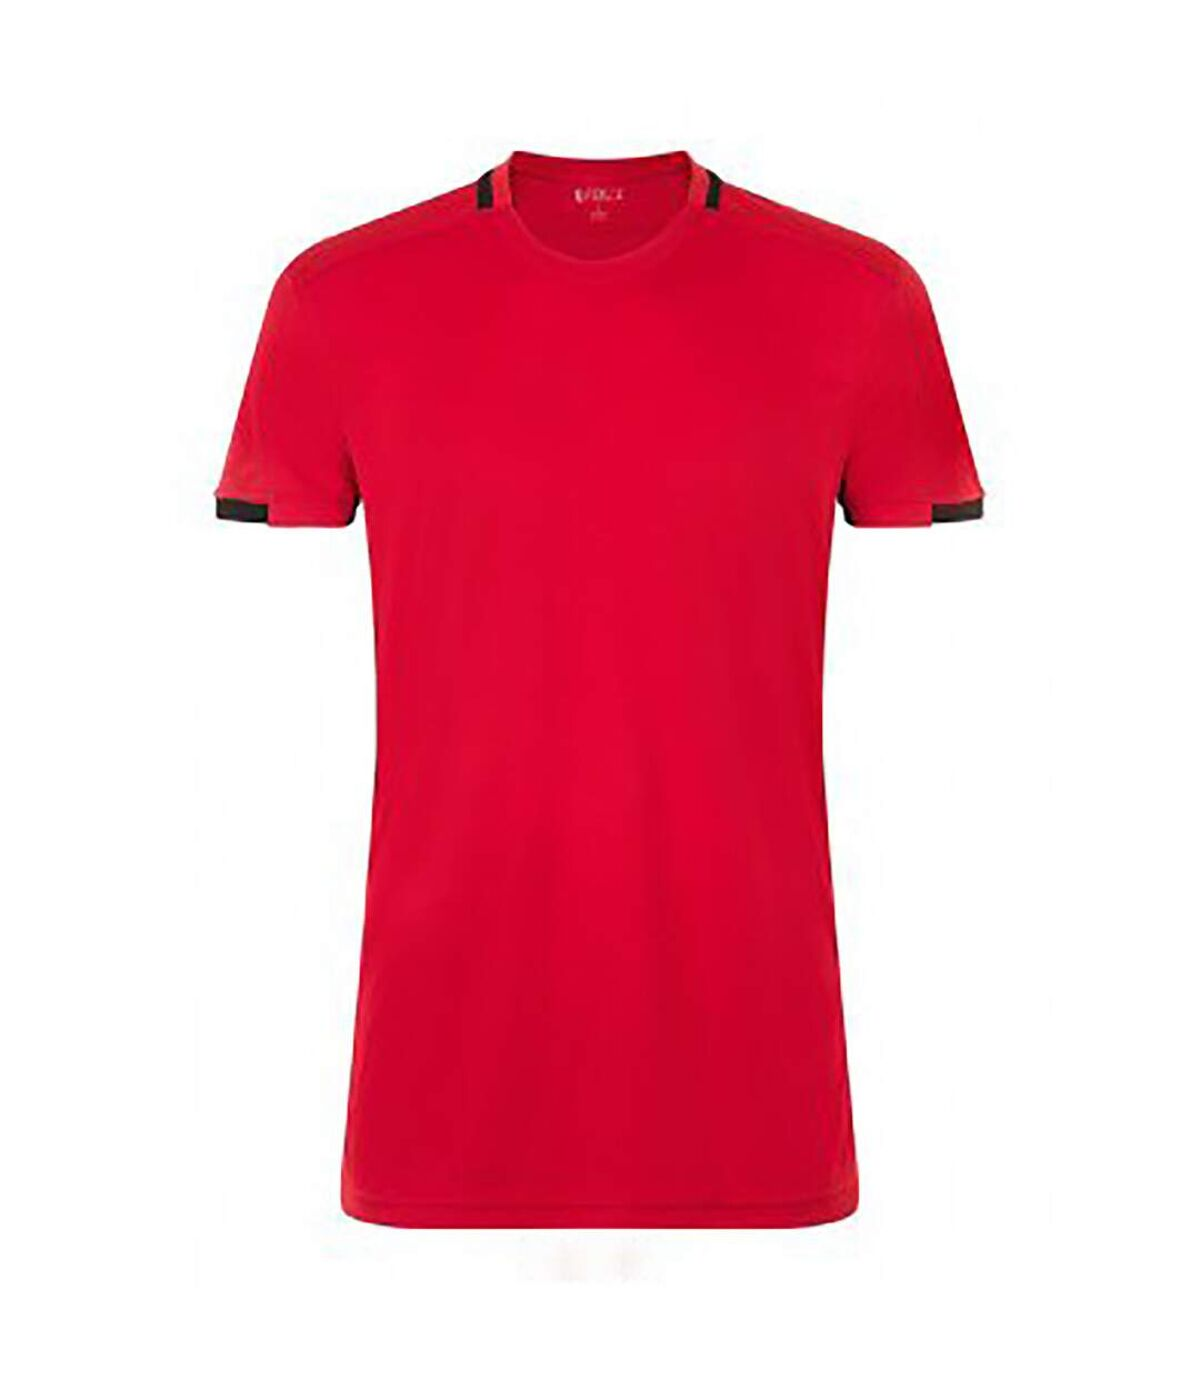 SOLS Mens Classico Contrast Short Sleeve Football T-Shirt (Black/White) - UTPC2787